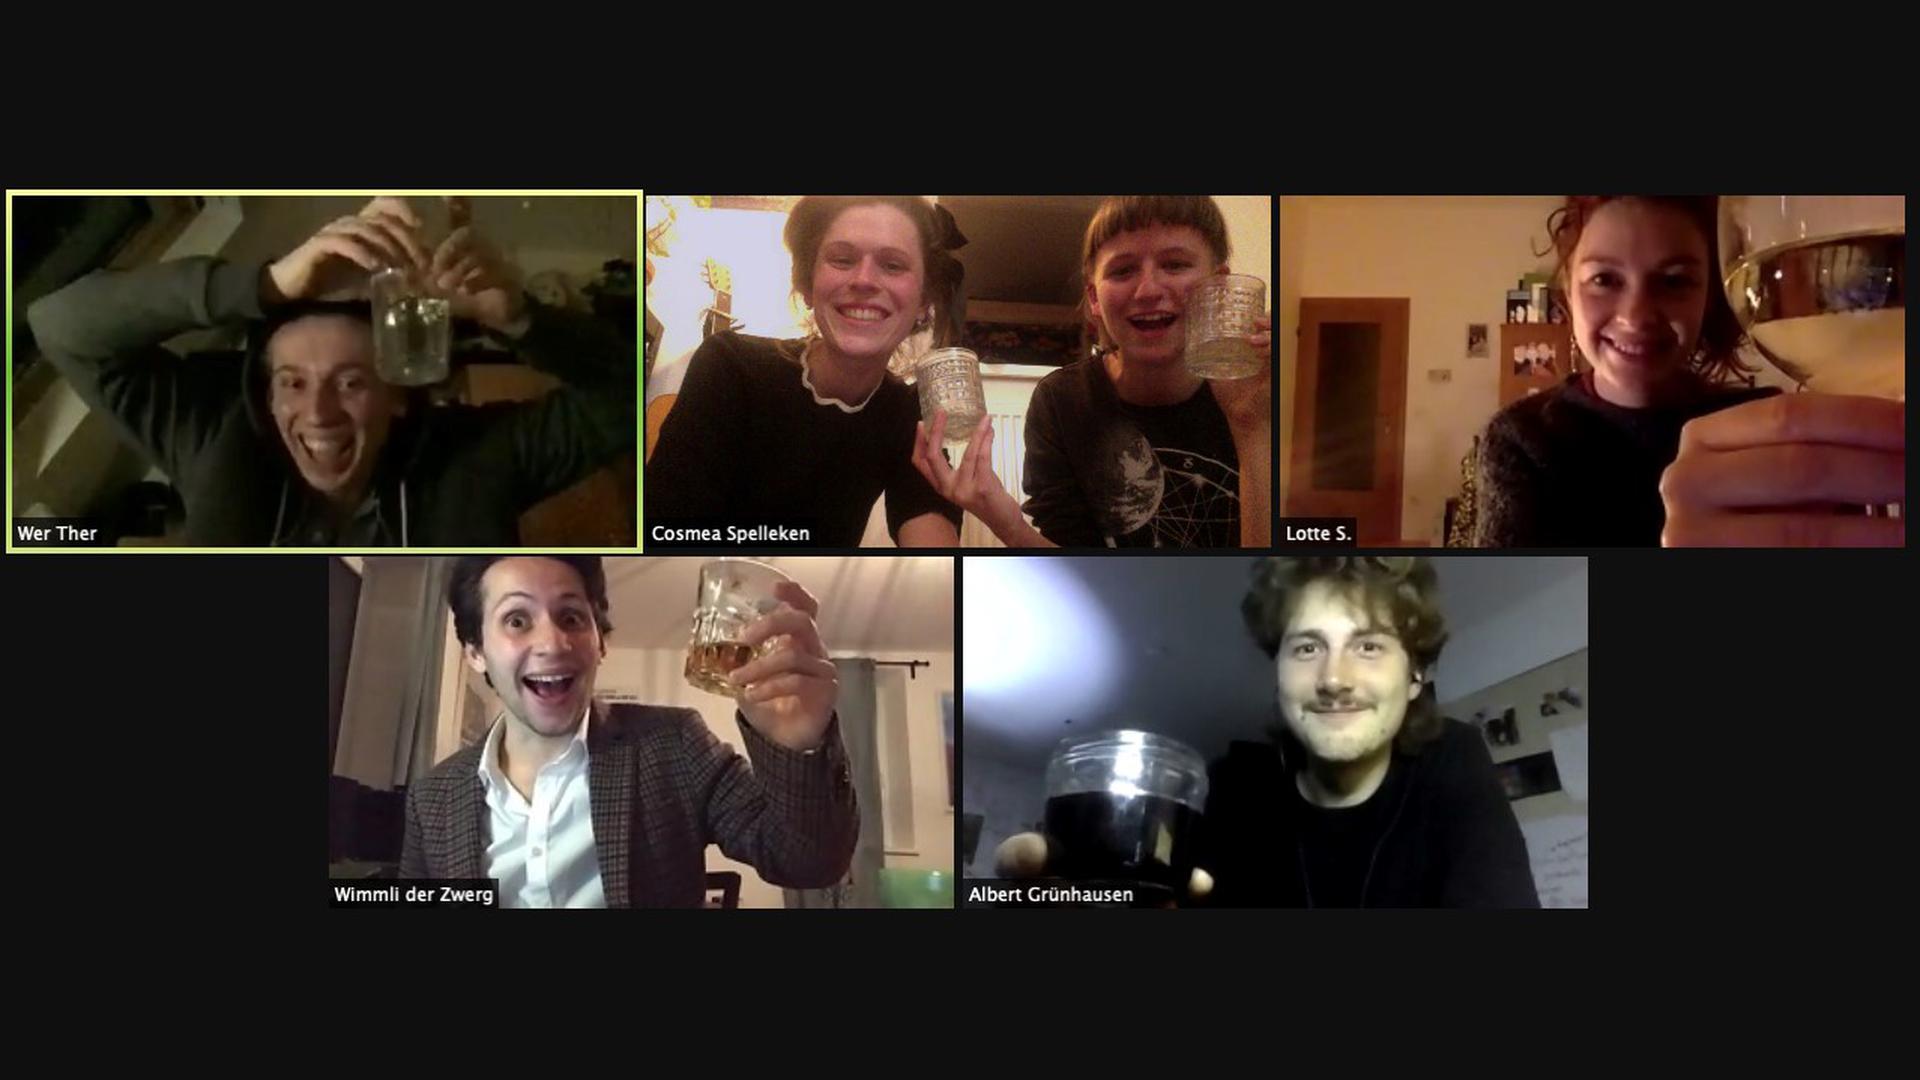 Stoßen am Bildschirm an: Jonny Hoff, Regisseurin Cosmea Spelleken und Lotta Schweikert, Klara Wördemann, Florian Gerteis und Michael Kranz